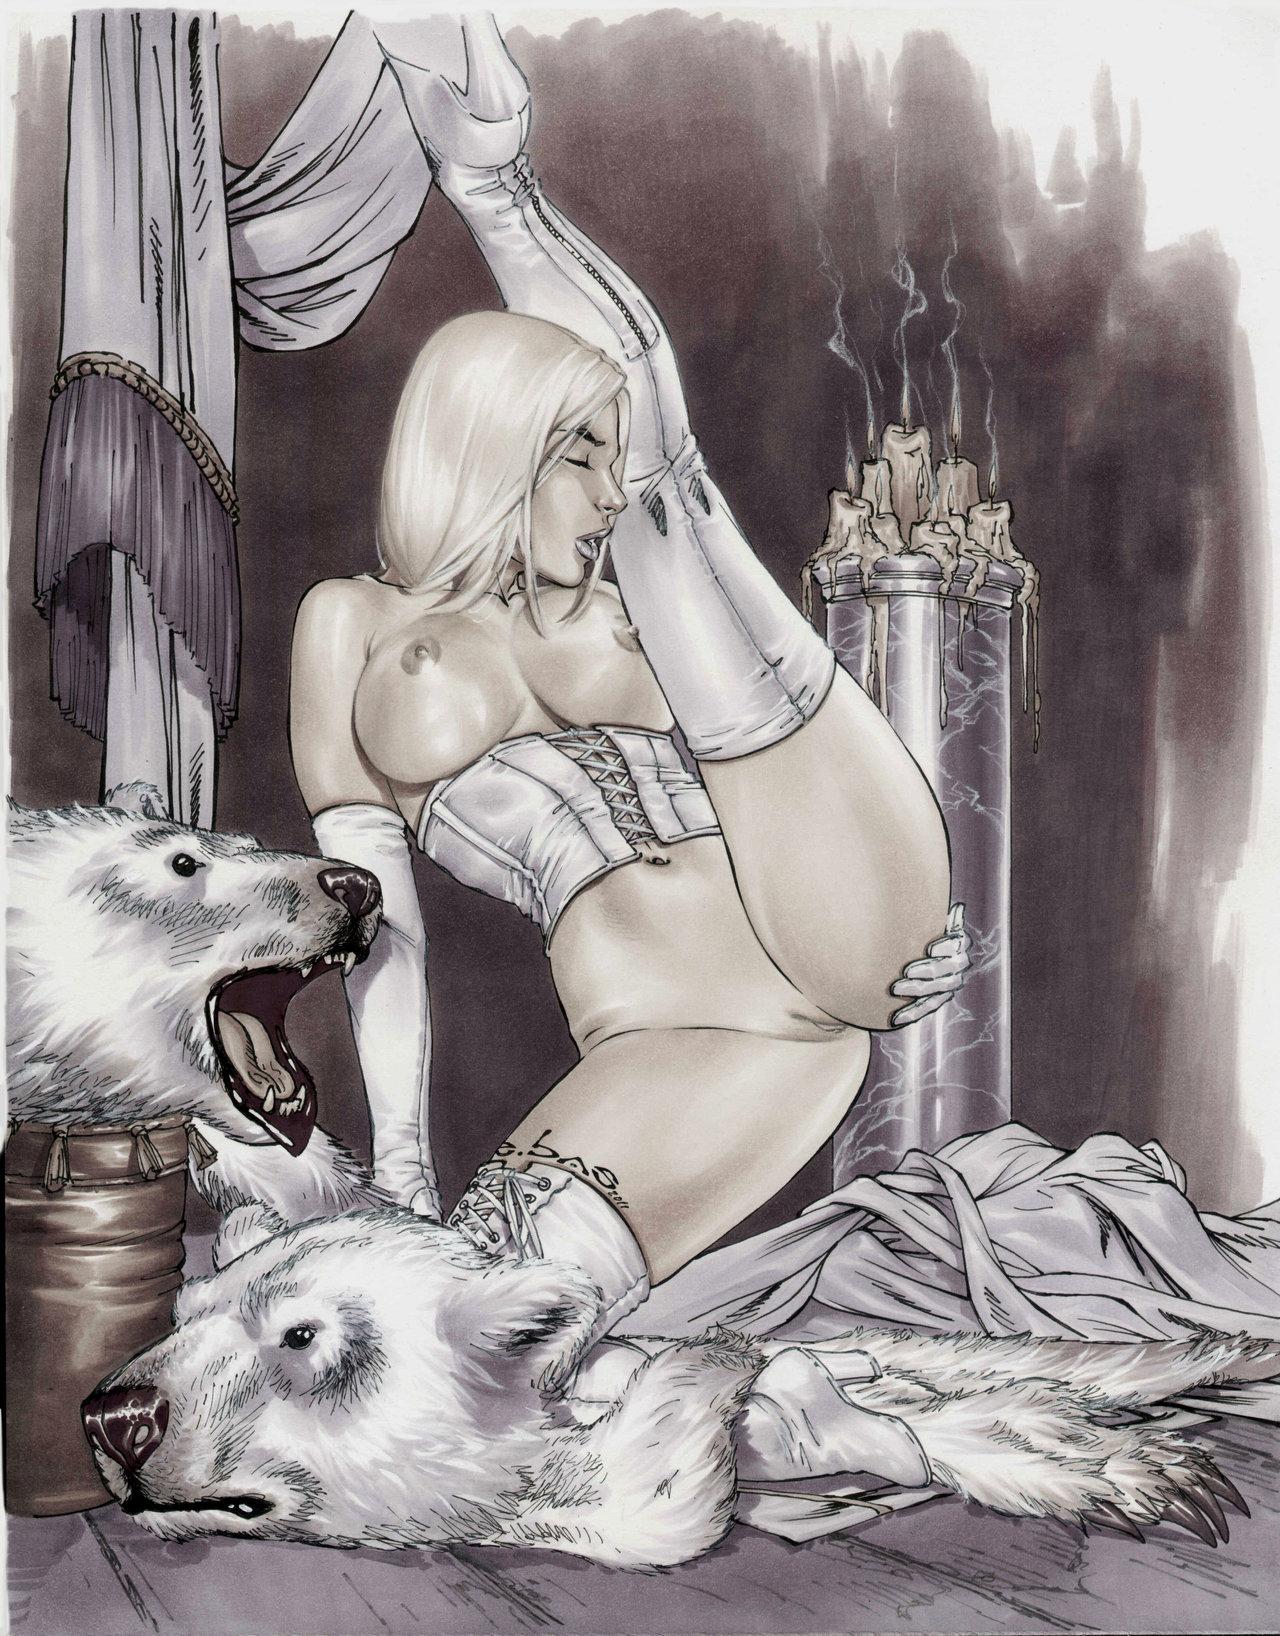 hot nude women of comic art